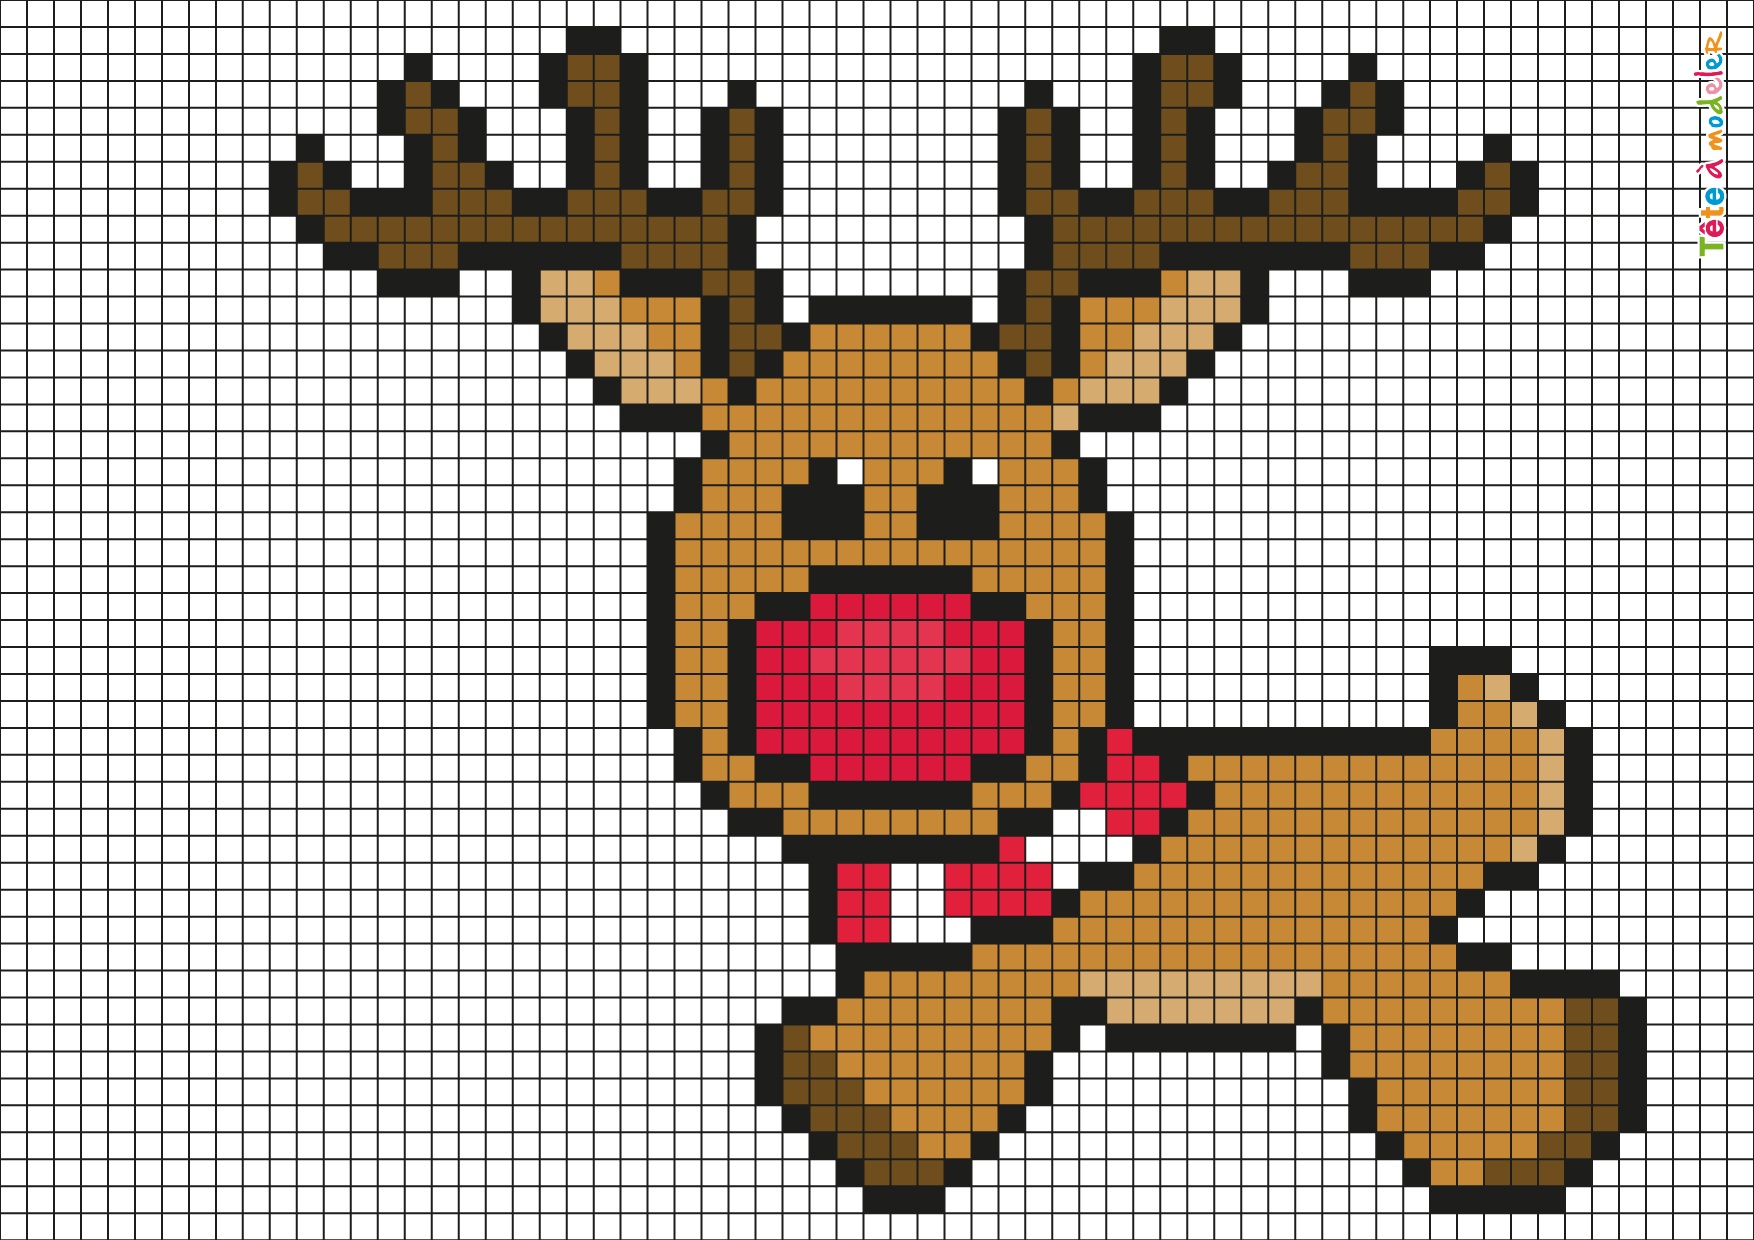 Pixel Art Renne De Noël Par Tête À Modeler serapportantà Pixel Art De Noël